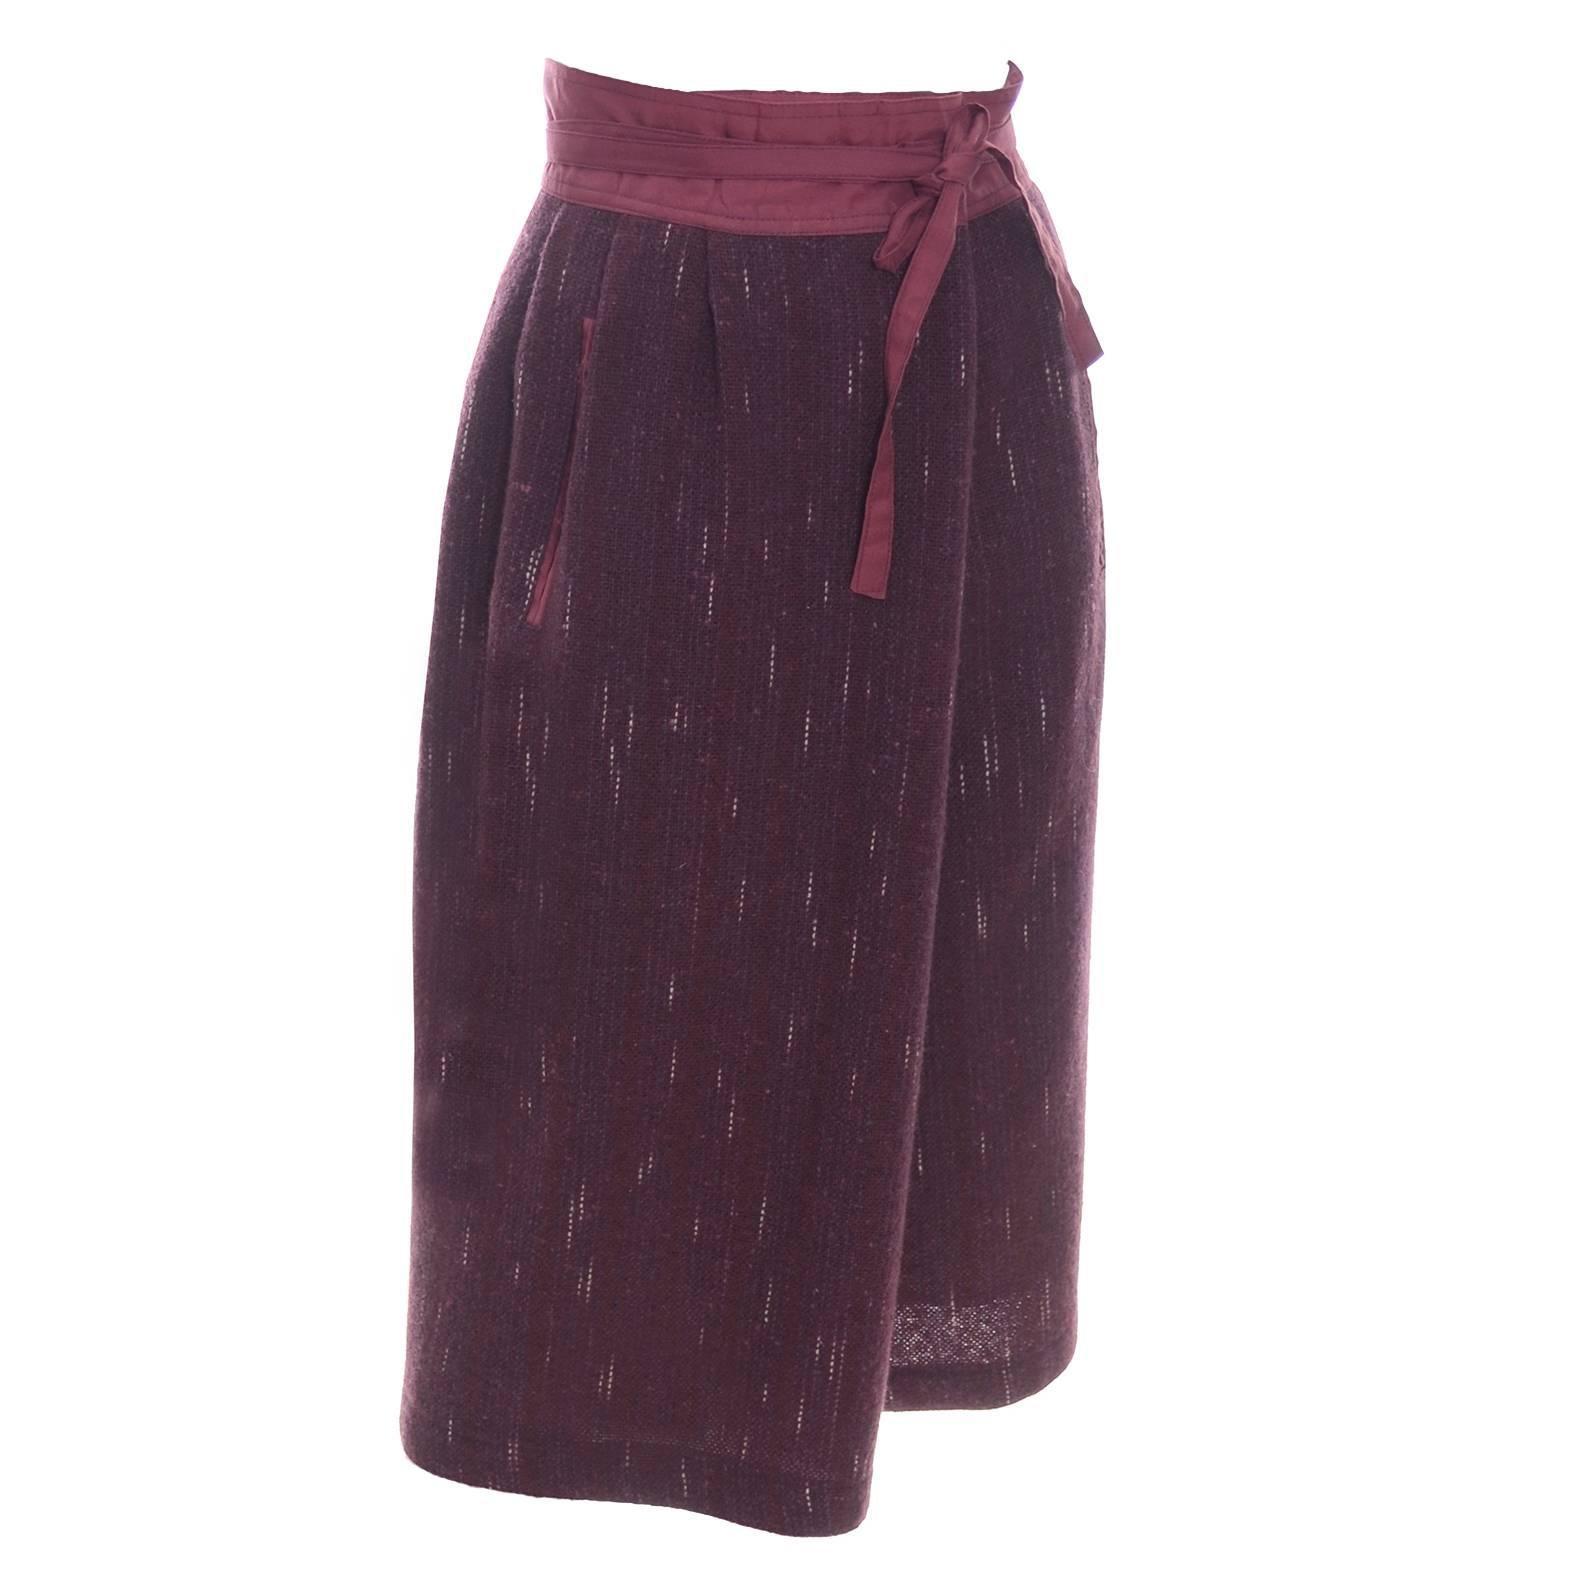 Kenzo Vintage Skirt Rare Jap Label Made in France Unique style Wool Lined Pocket